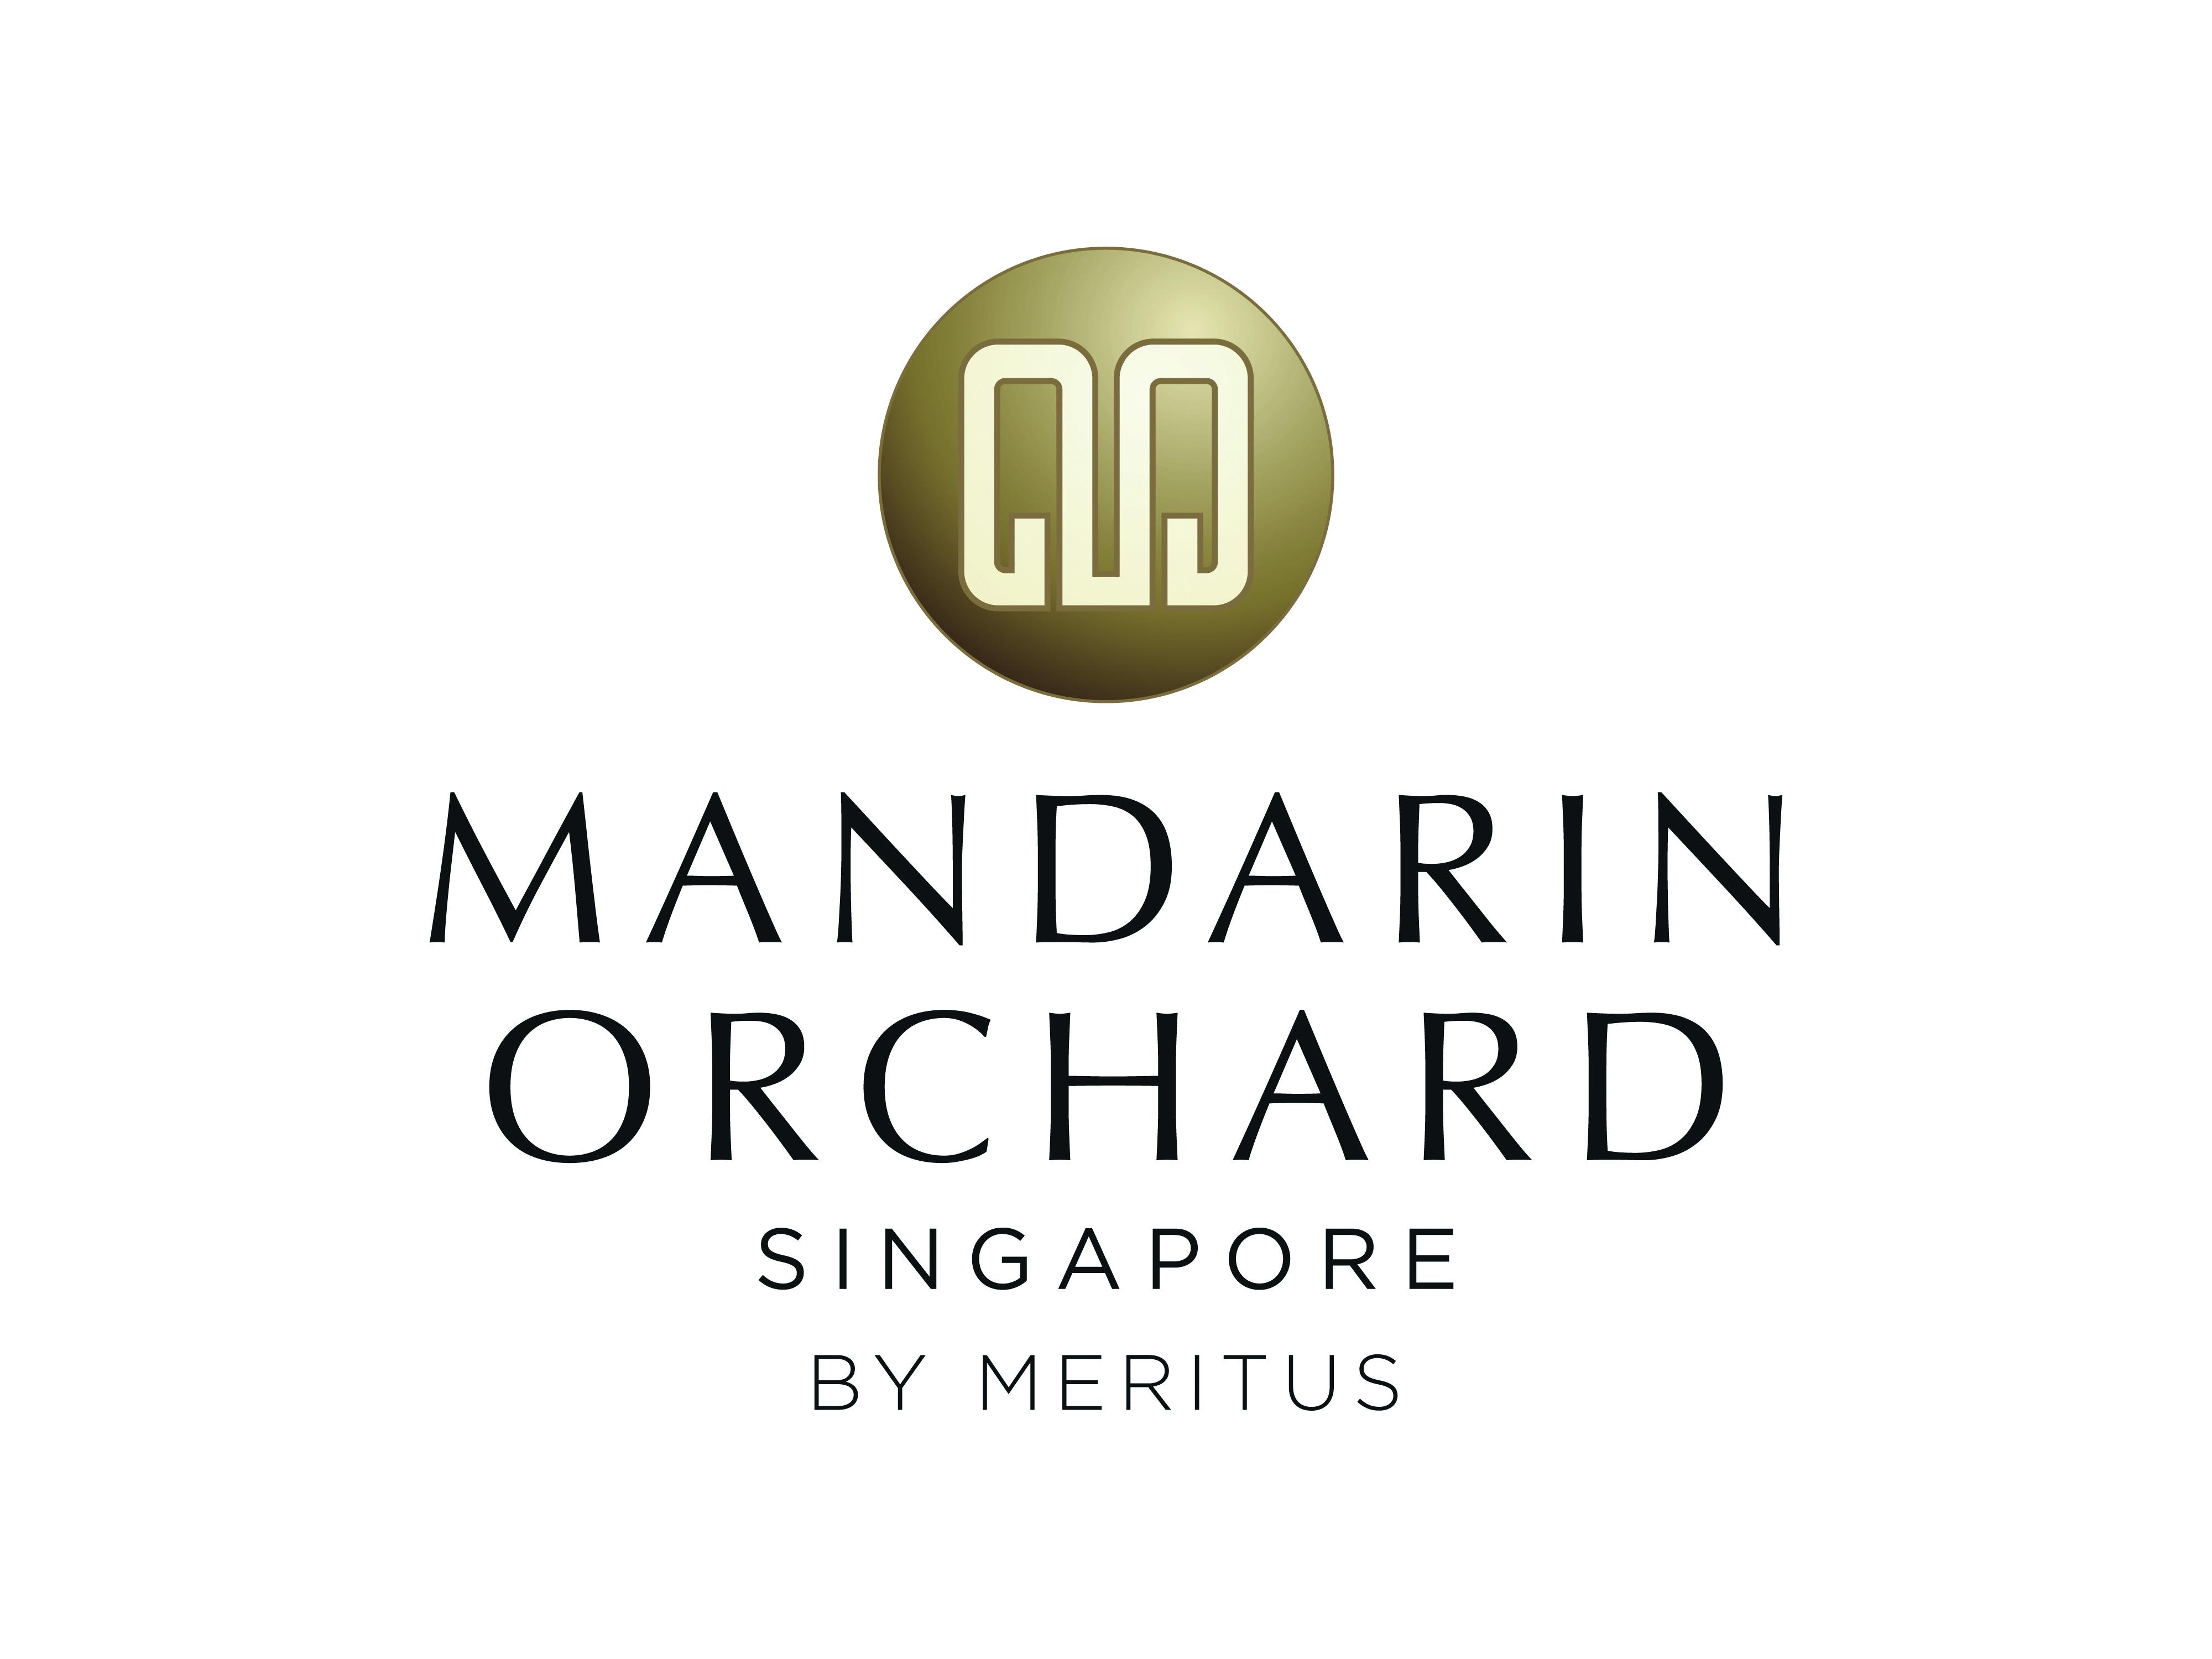 Mandarin Orchard